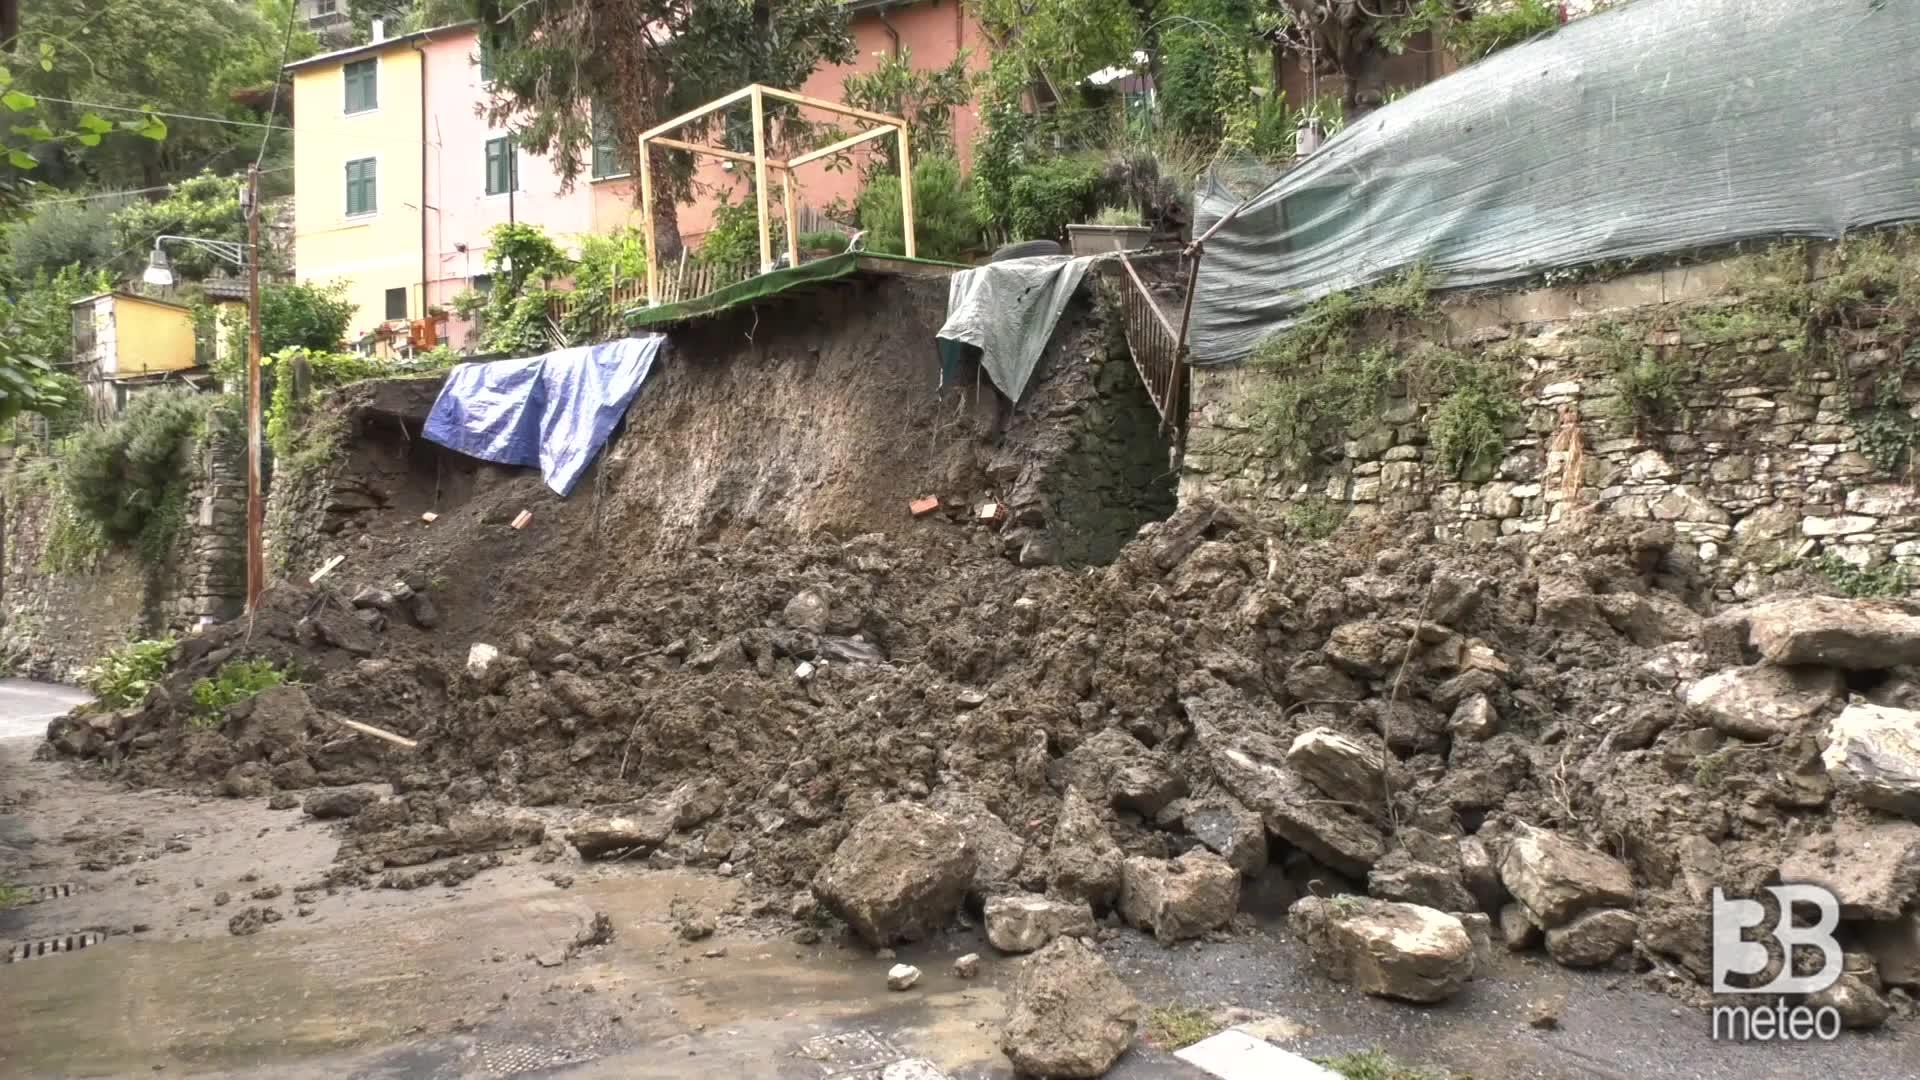 Maltempo, grossa frana a Genova: famiglie evacuate